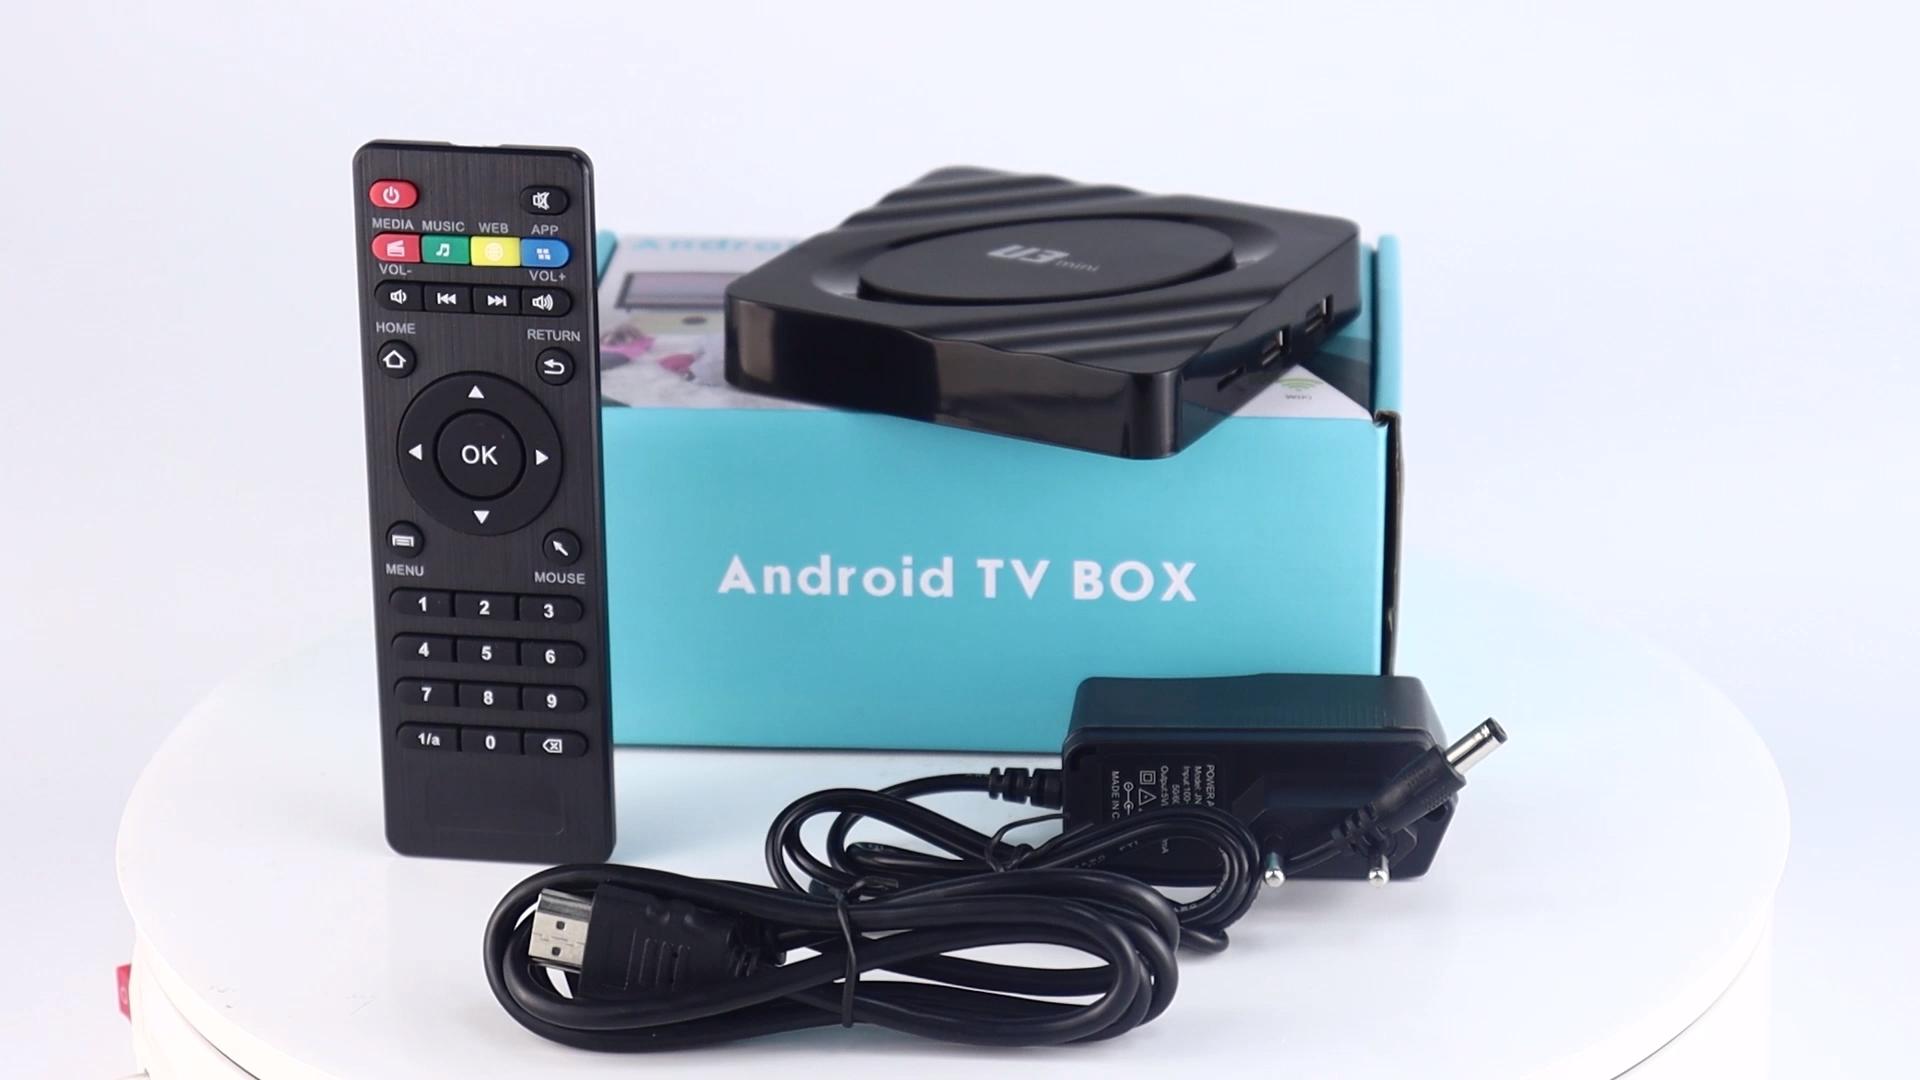 U3 S905W تلفزيون بالإنترنت مجموعة تي في بوكس أندرويد 2gb ram 16gb rom tv box